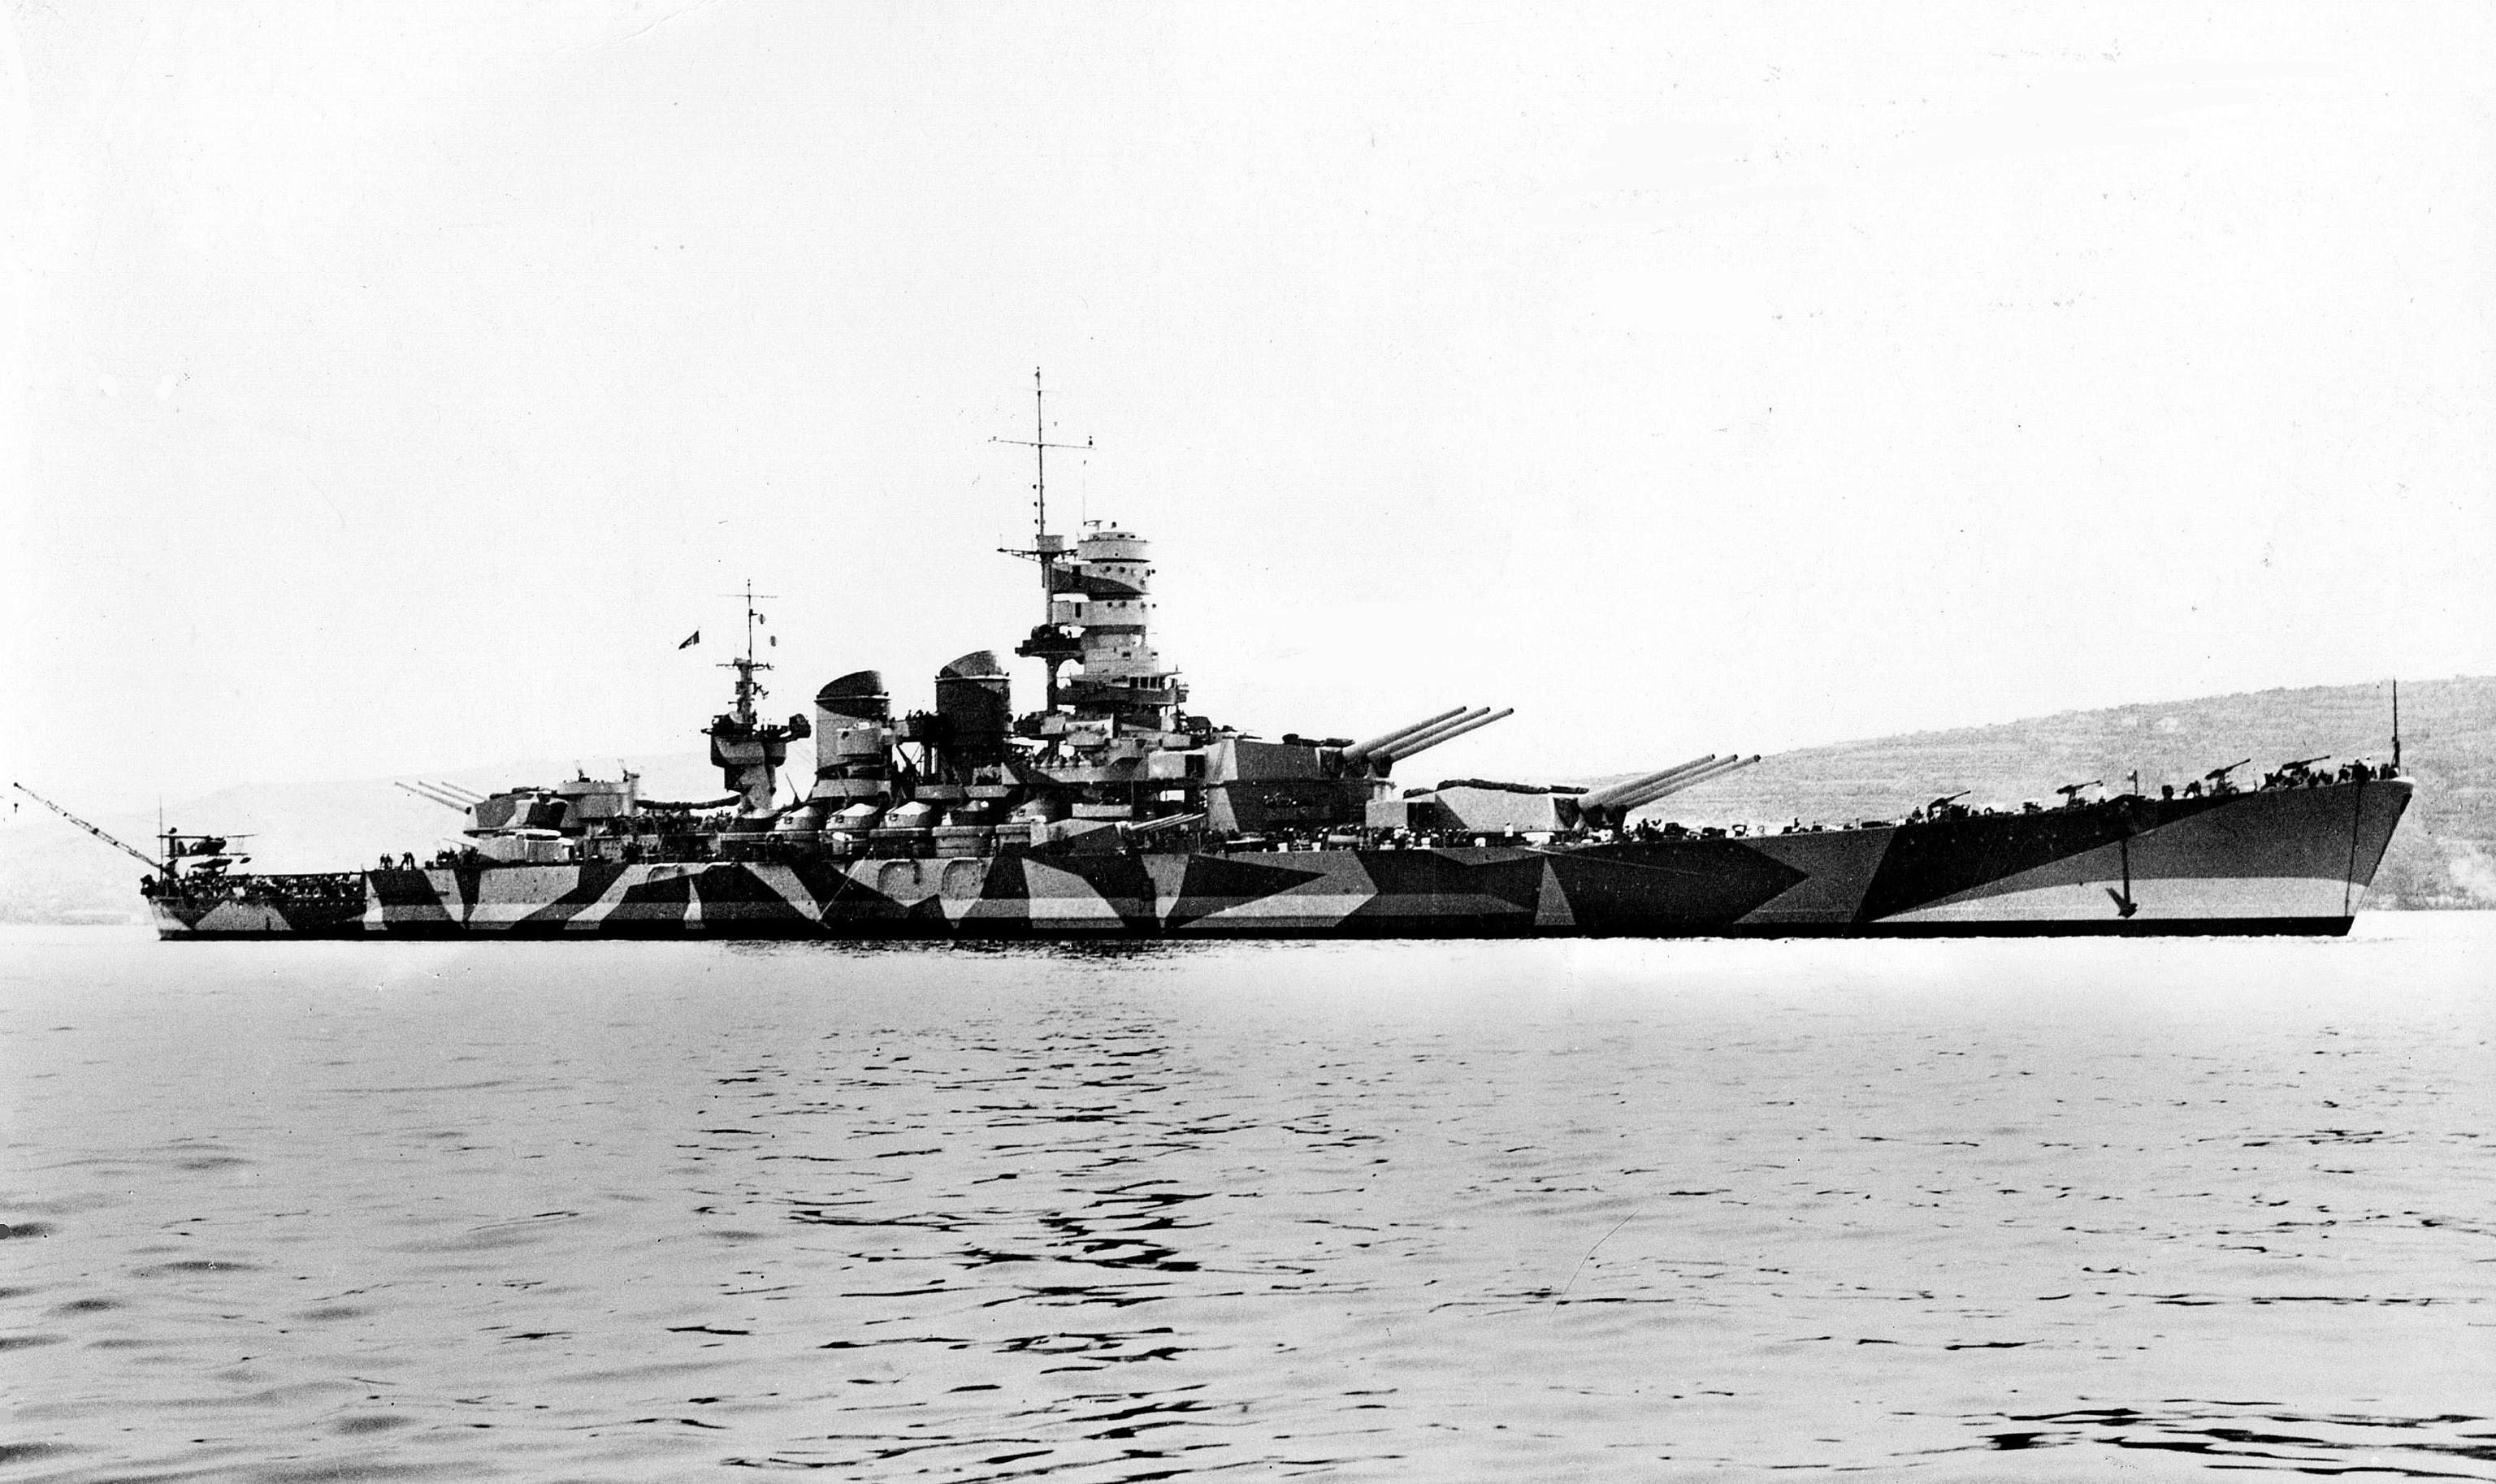 Wwii italy navy battleship roma 1943 plastic model images list - Italian Battleship Roma Of The Littorio Class In Splinter Camouflage Circa 1942 43 3072x1827